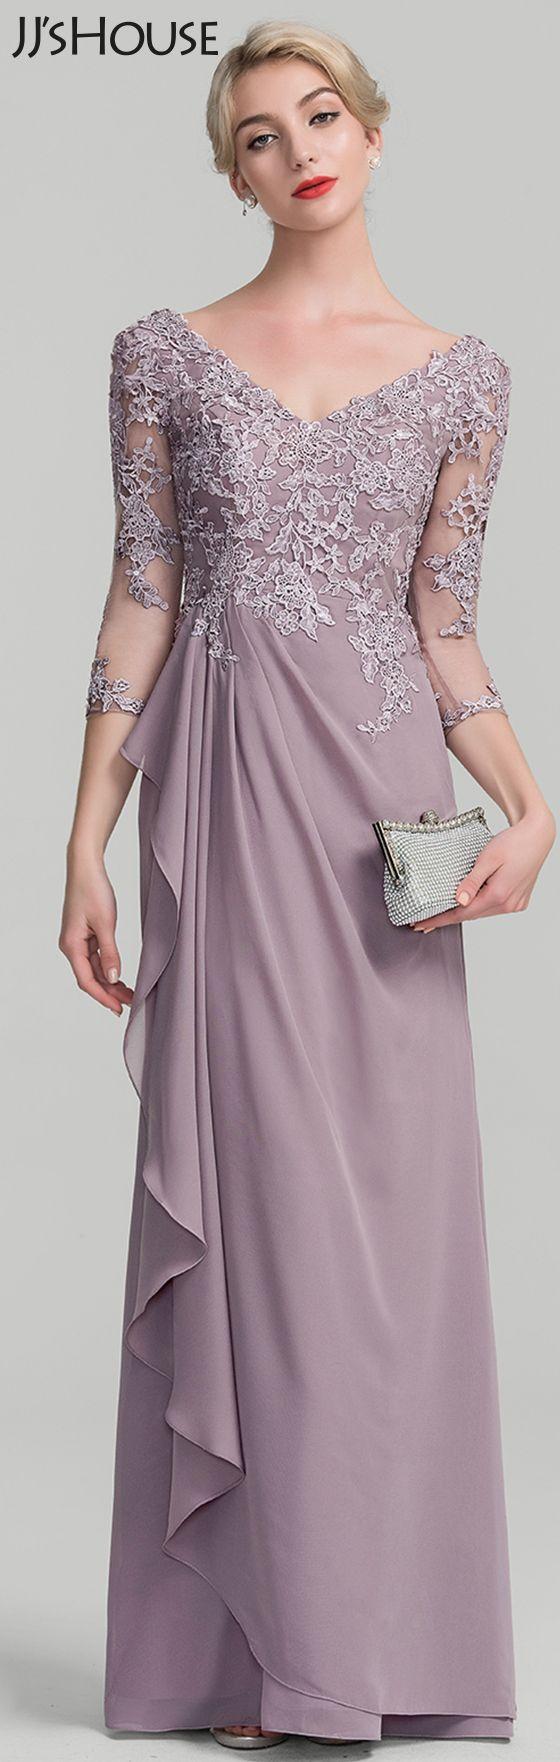 JJsHouse #Mother | Vestidos | Pinterest | Vestiditos, Vestidos de ...